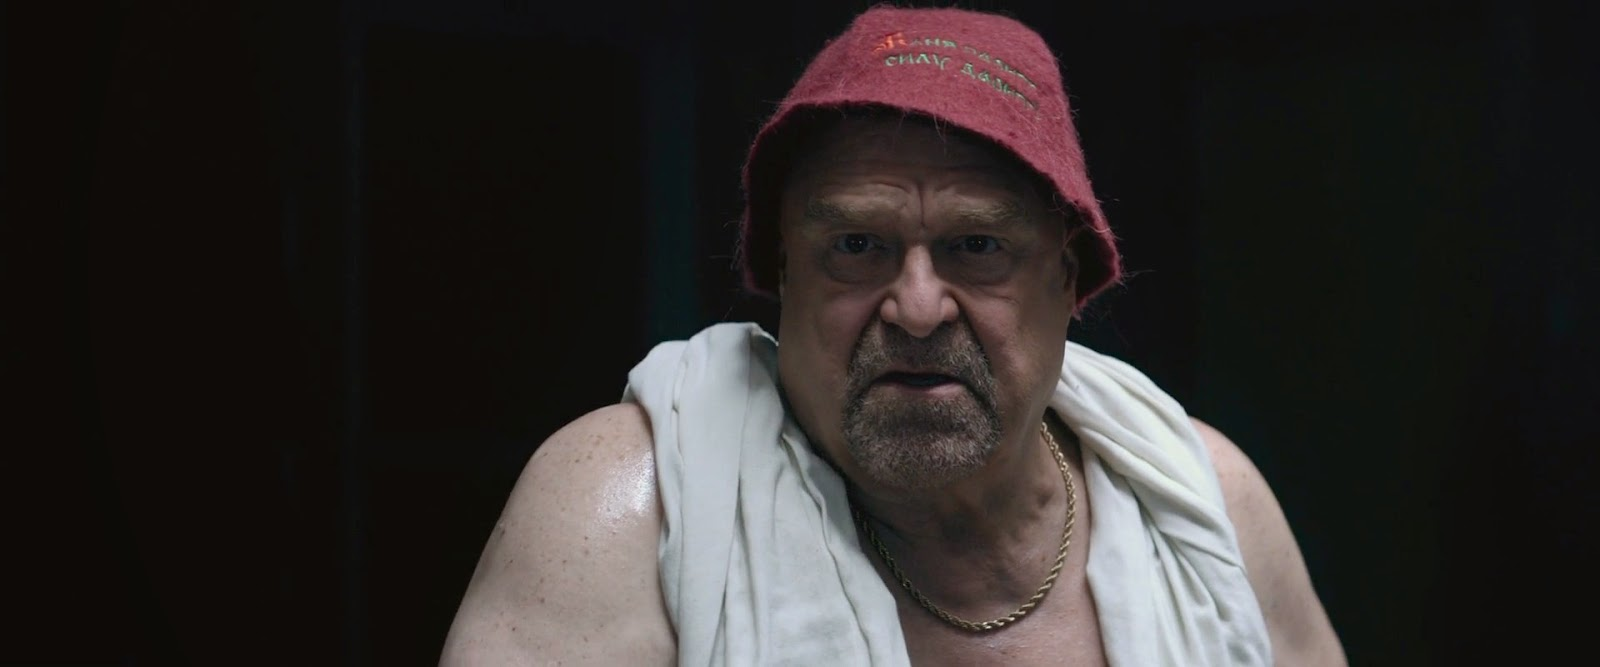 The Gambler (2014) S4 s The Gambler (2014)